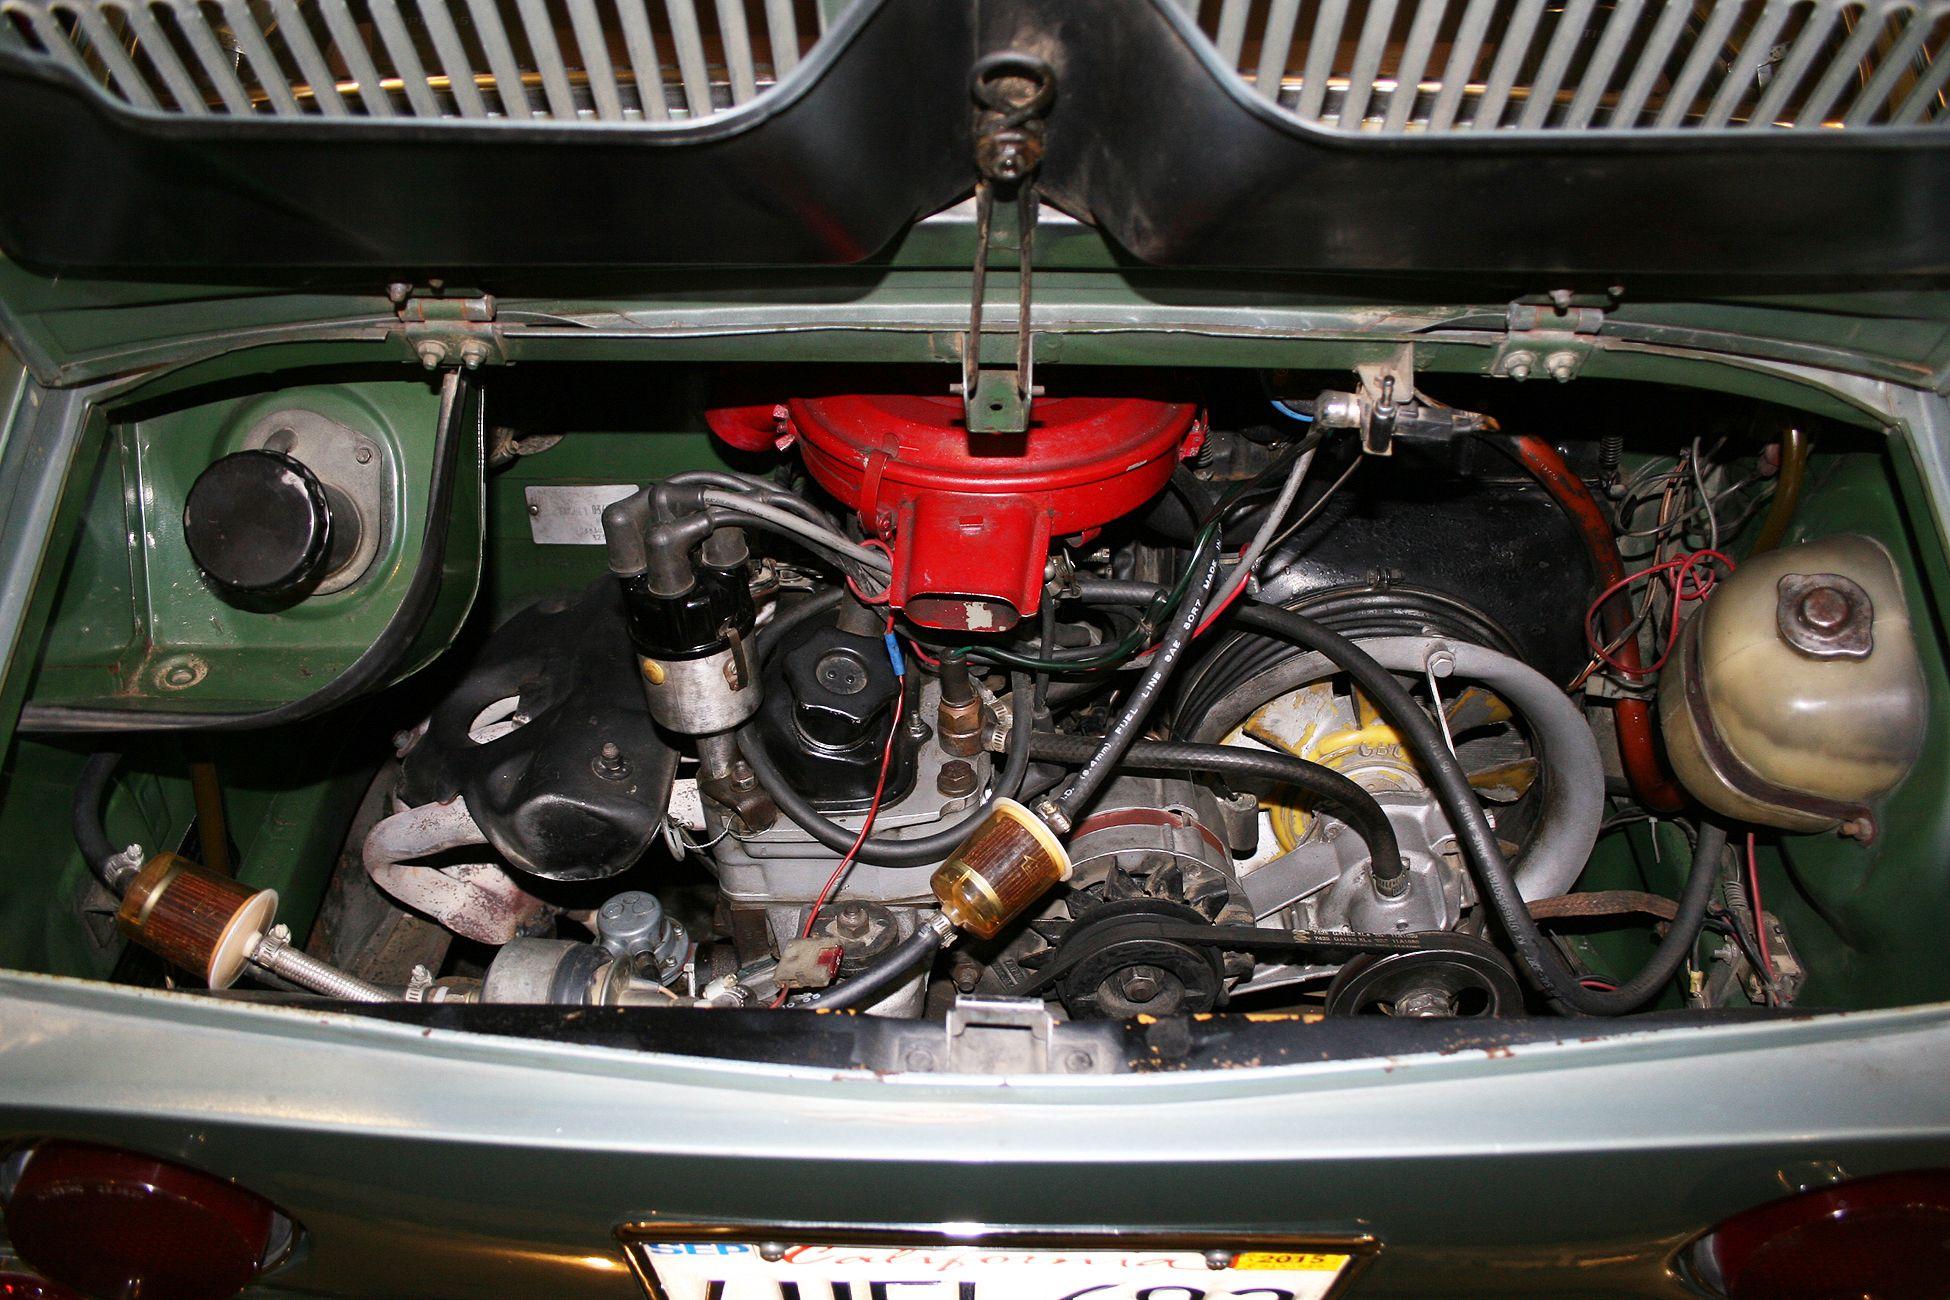 1971 Fiat 850 Sport Coupe Fiat 850 Fiat 850 Sport Coupe Sports